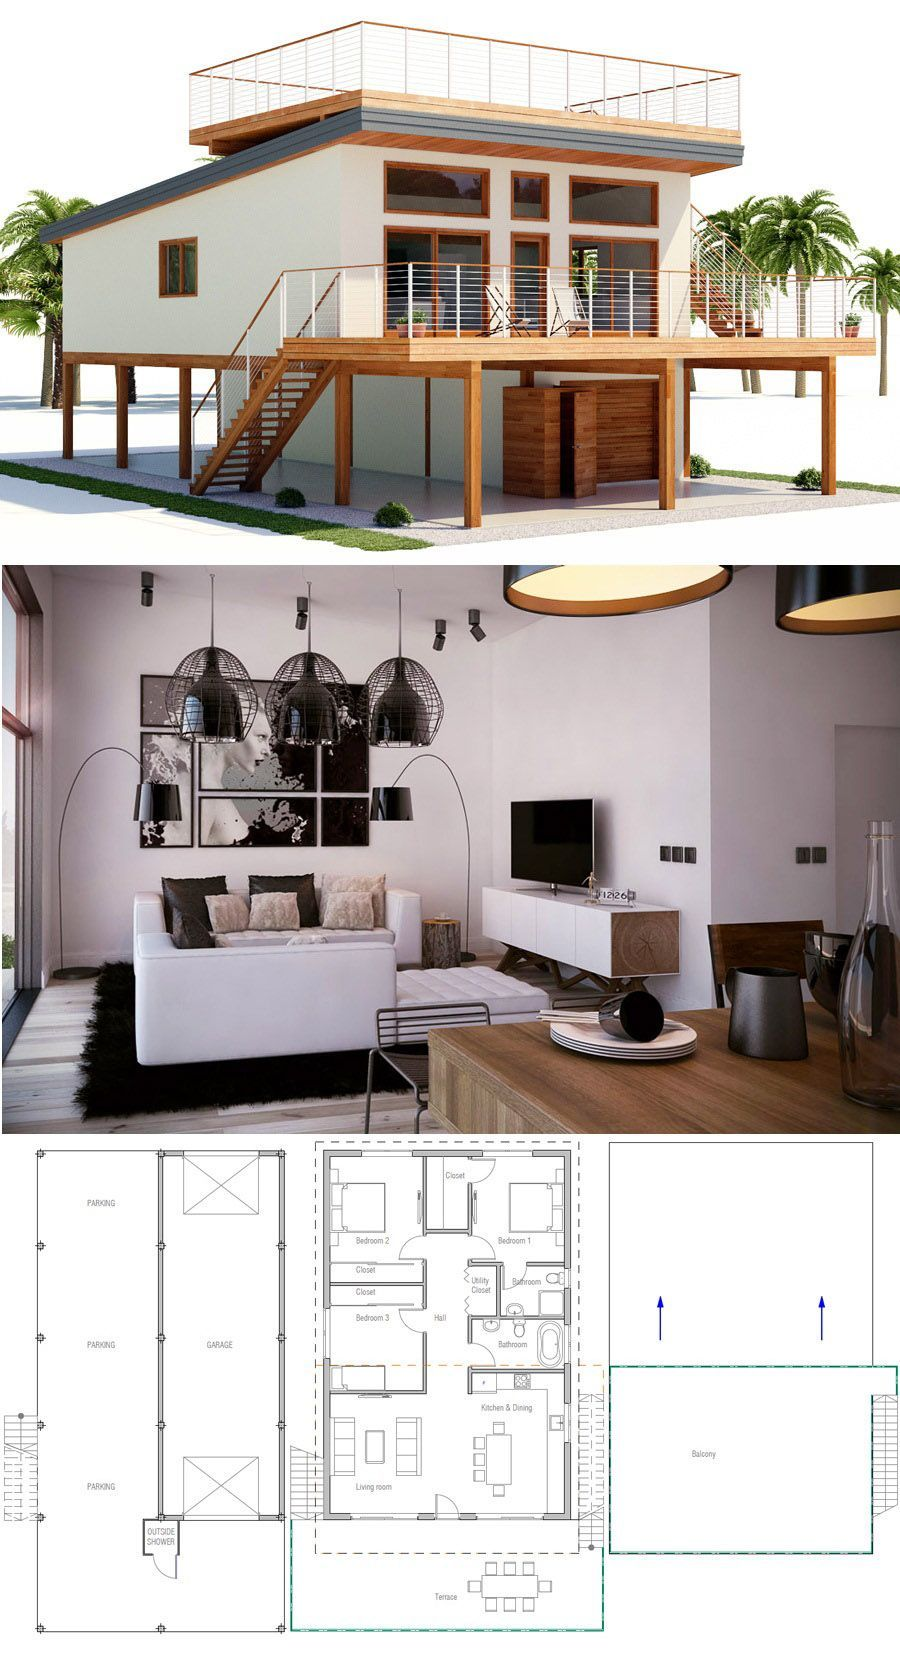 Plan De Maison House Design Homedesignplans Small House Plans House Floor Plans Sims House Plans